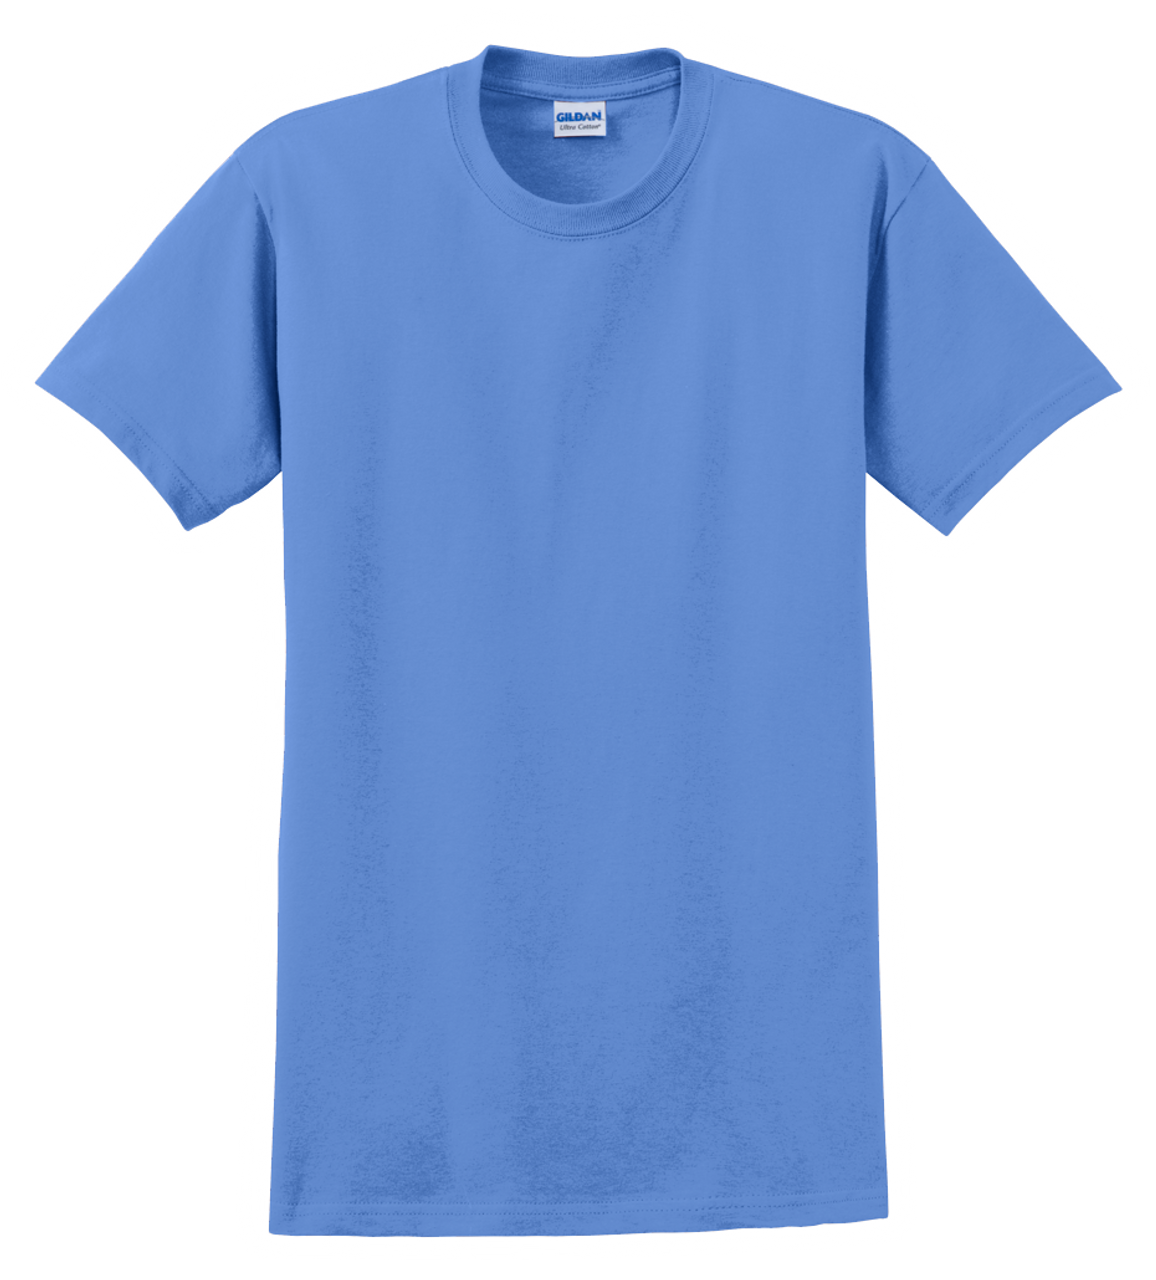 G2000 Carolina Blue T-Shirt Short Sleeve by Gildan